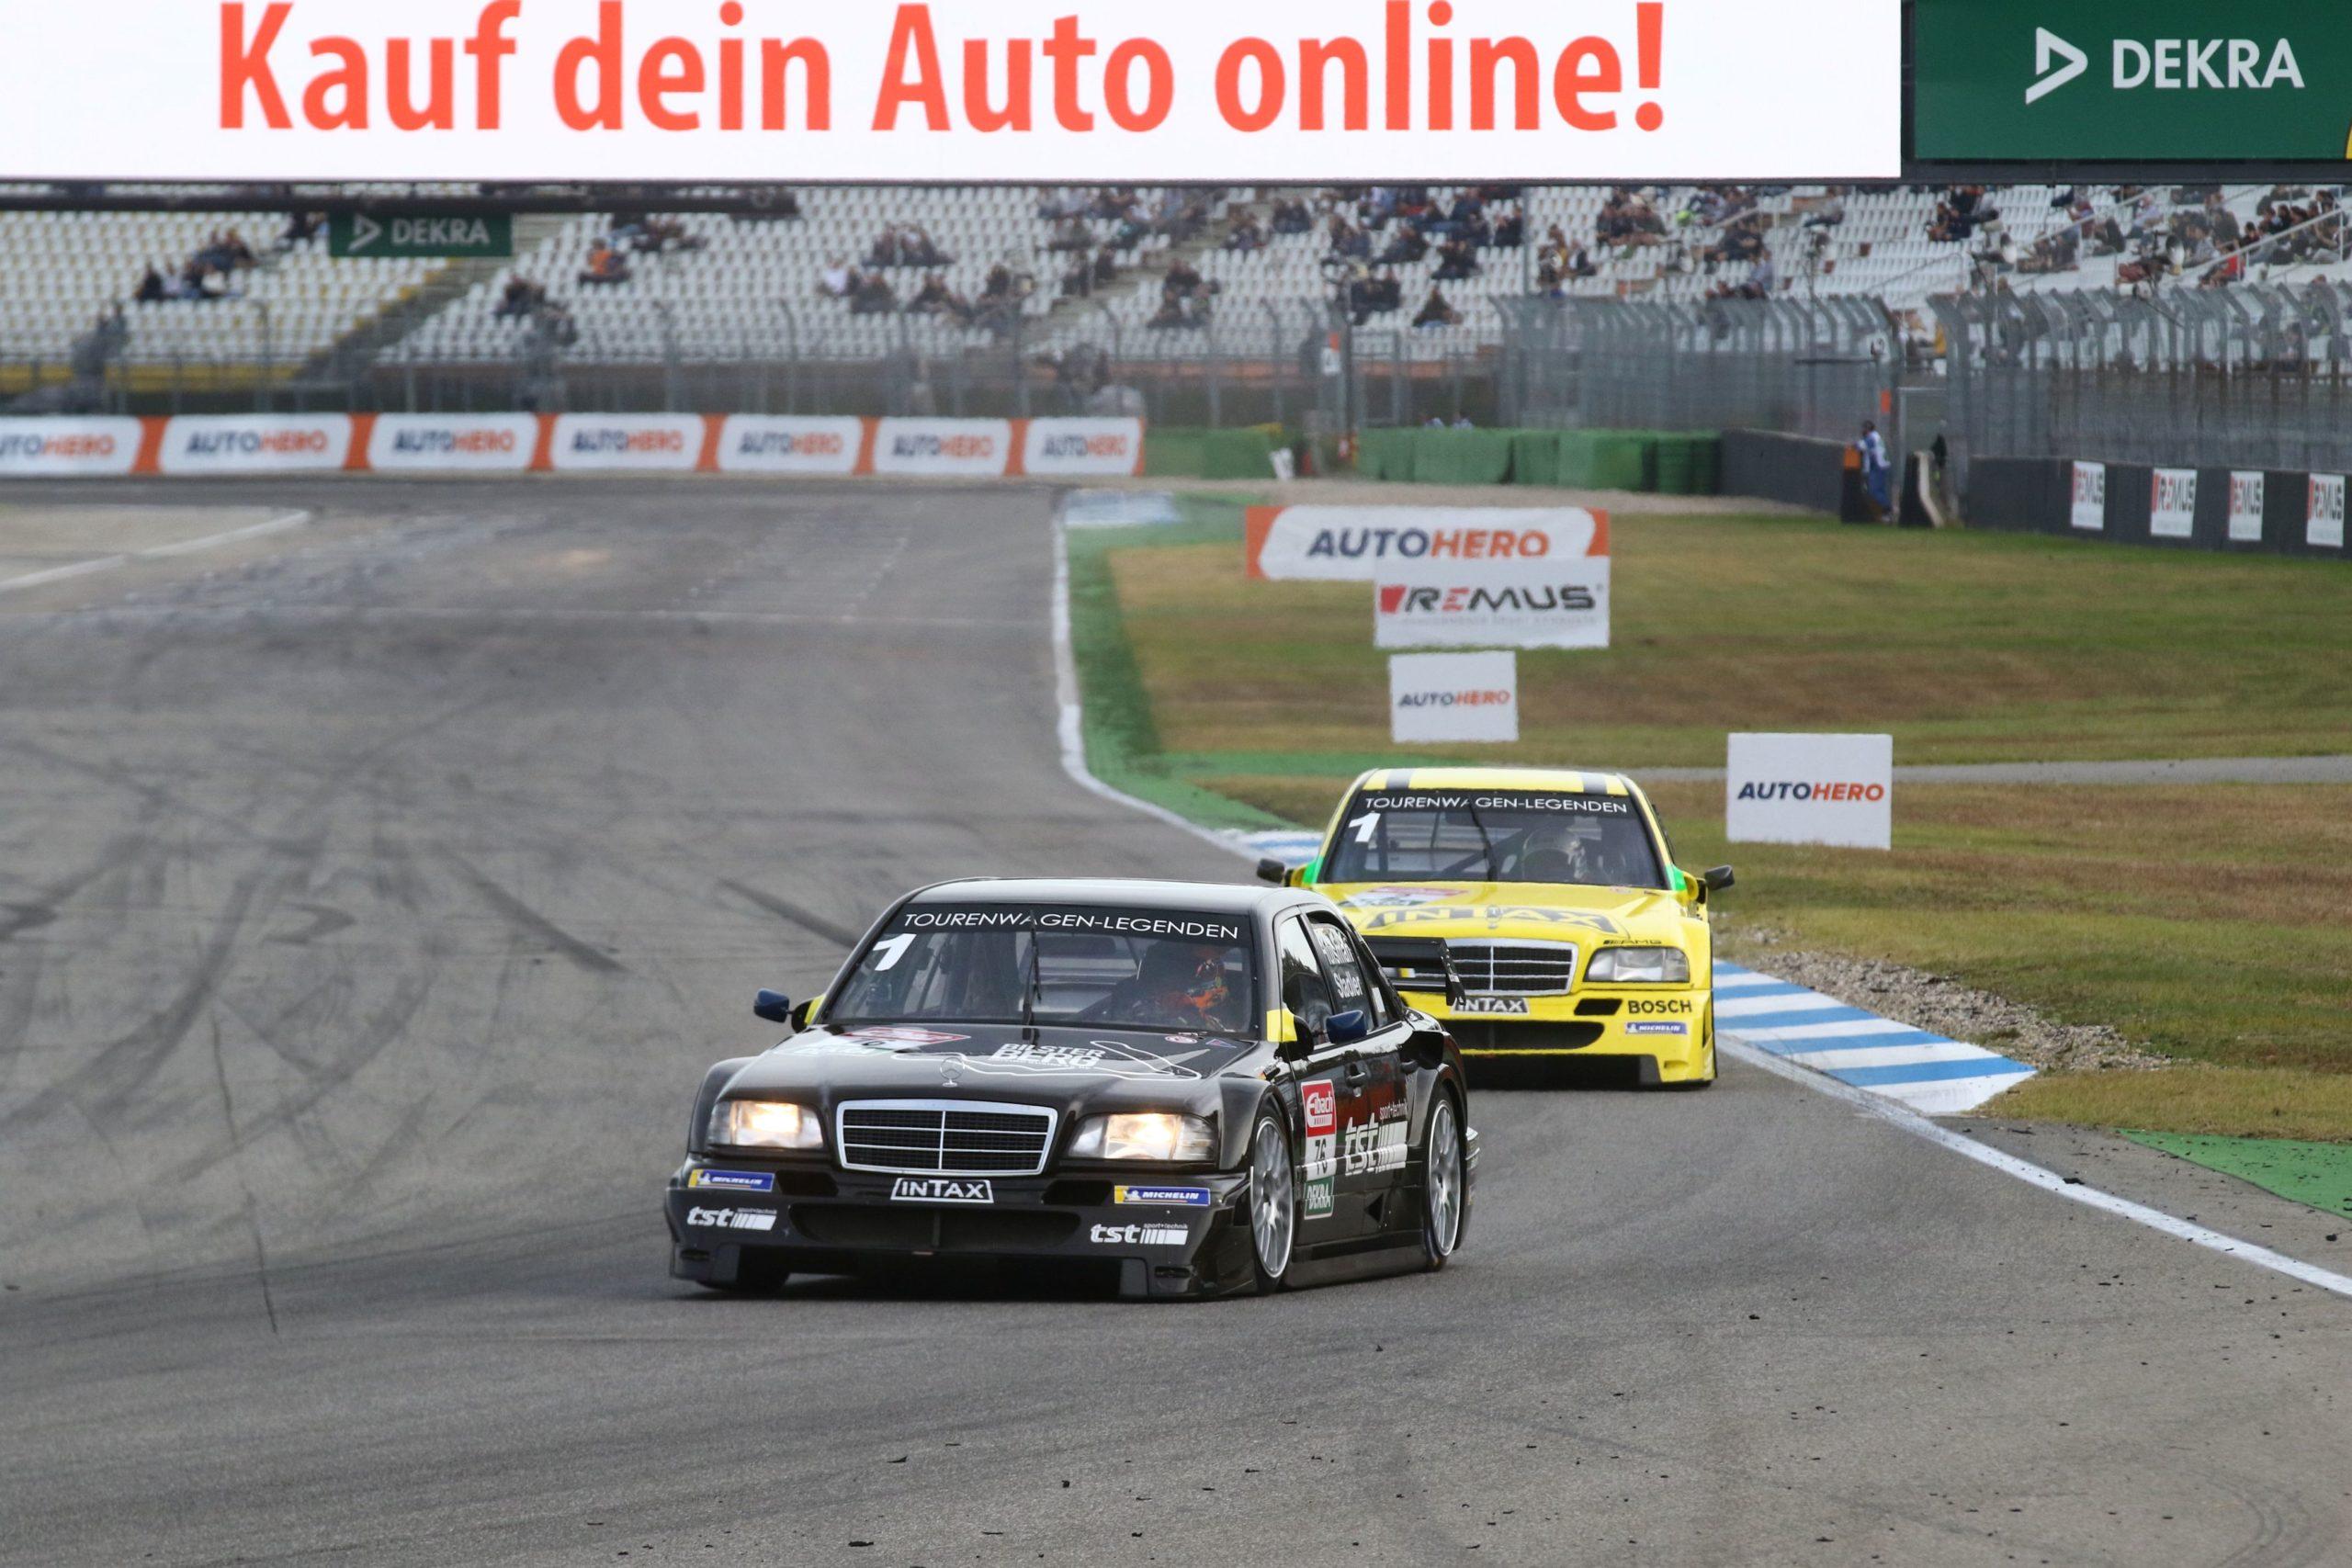 DTM-Classic-tst-sport-und-technik-Mercedes-Benz-Patrick-Huisman-2128298